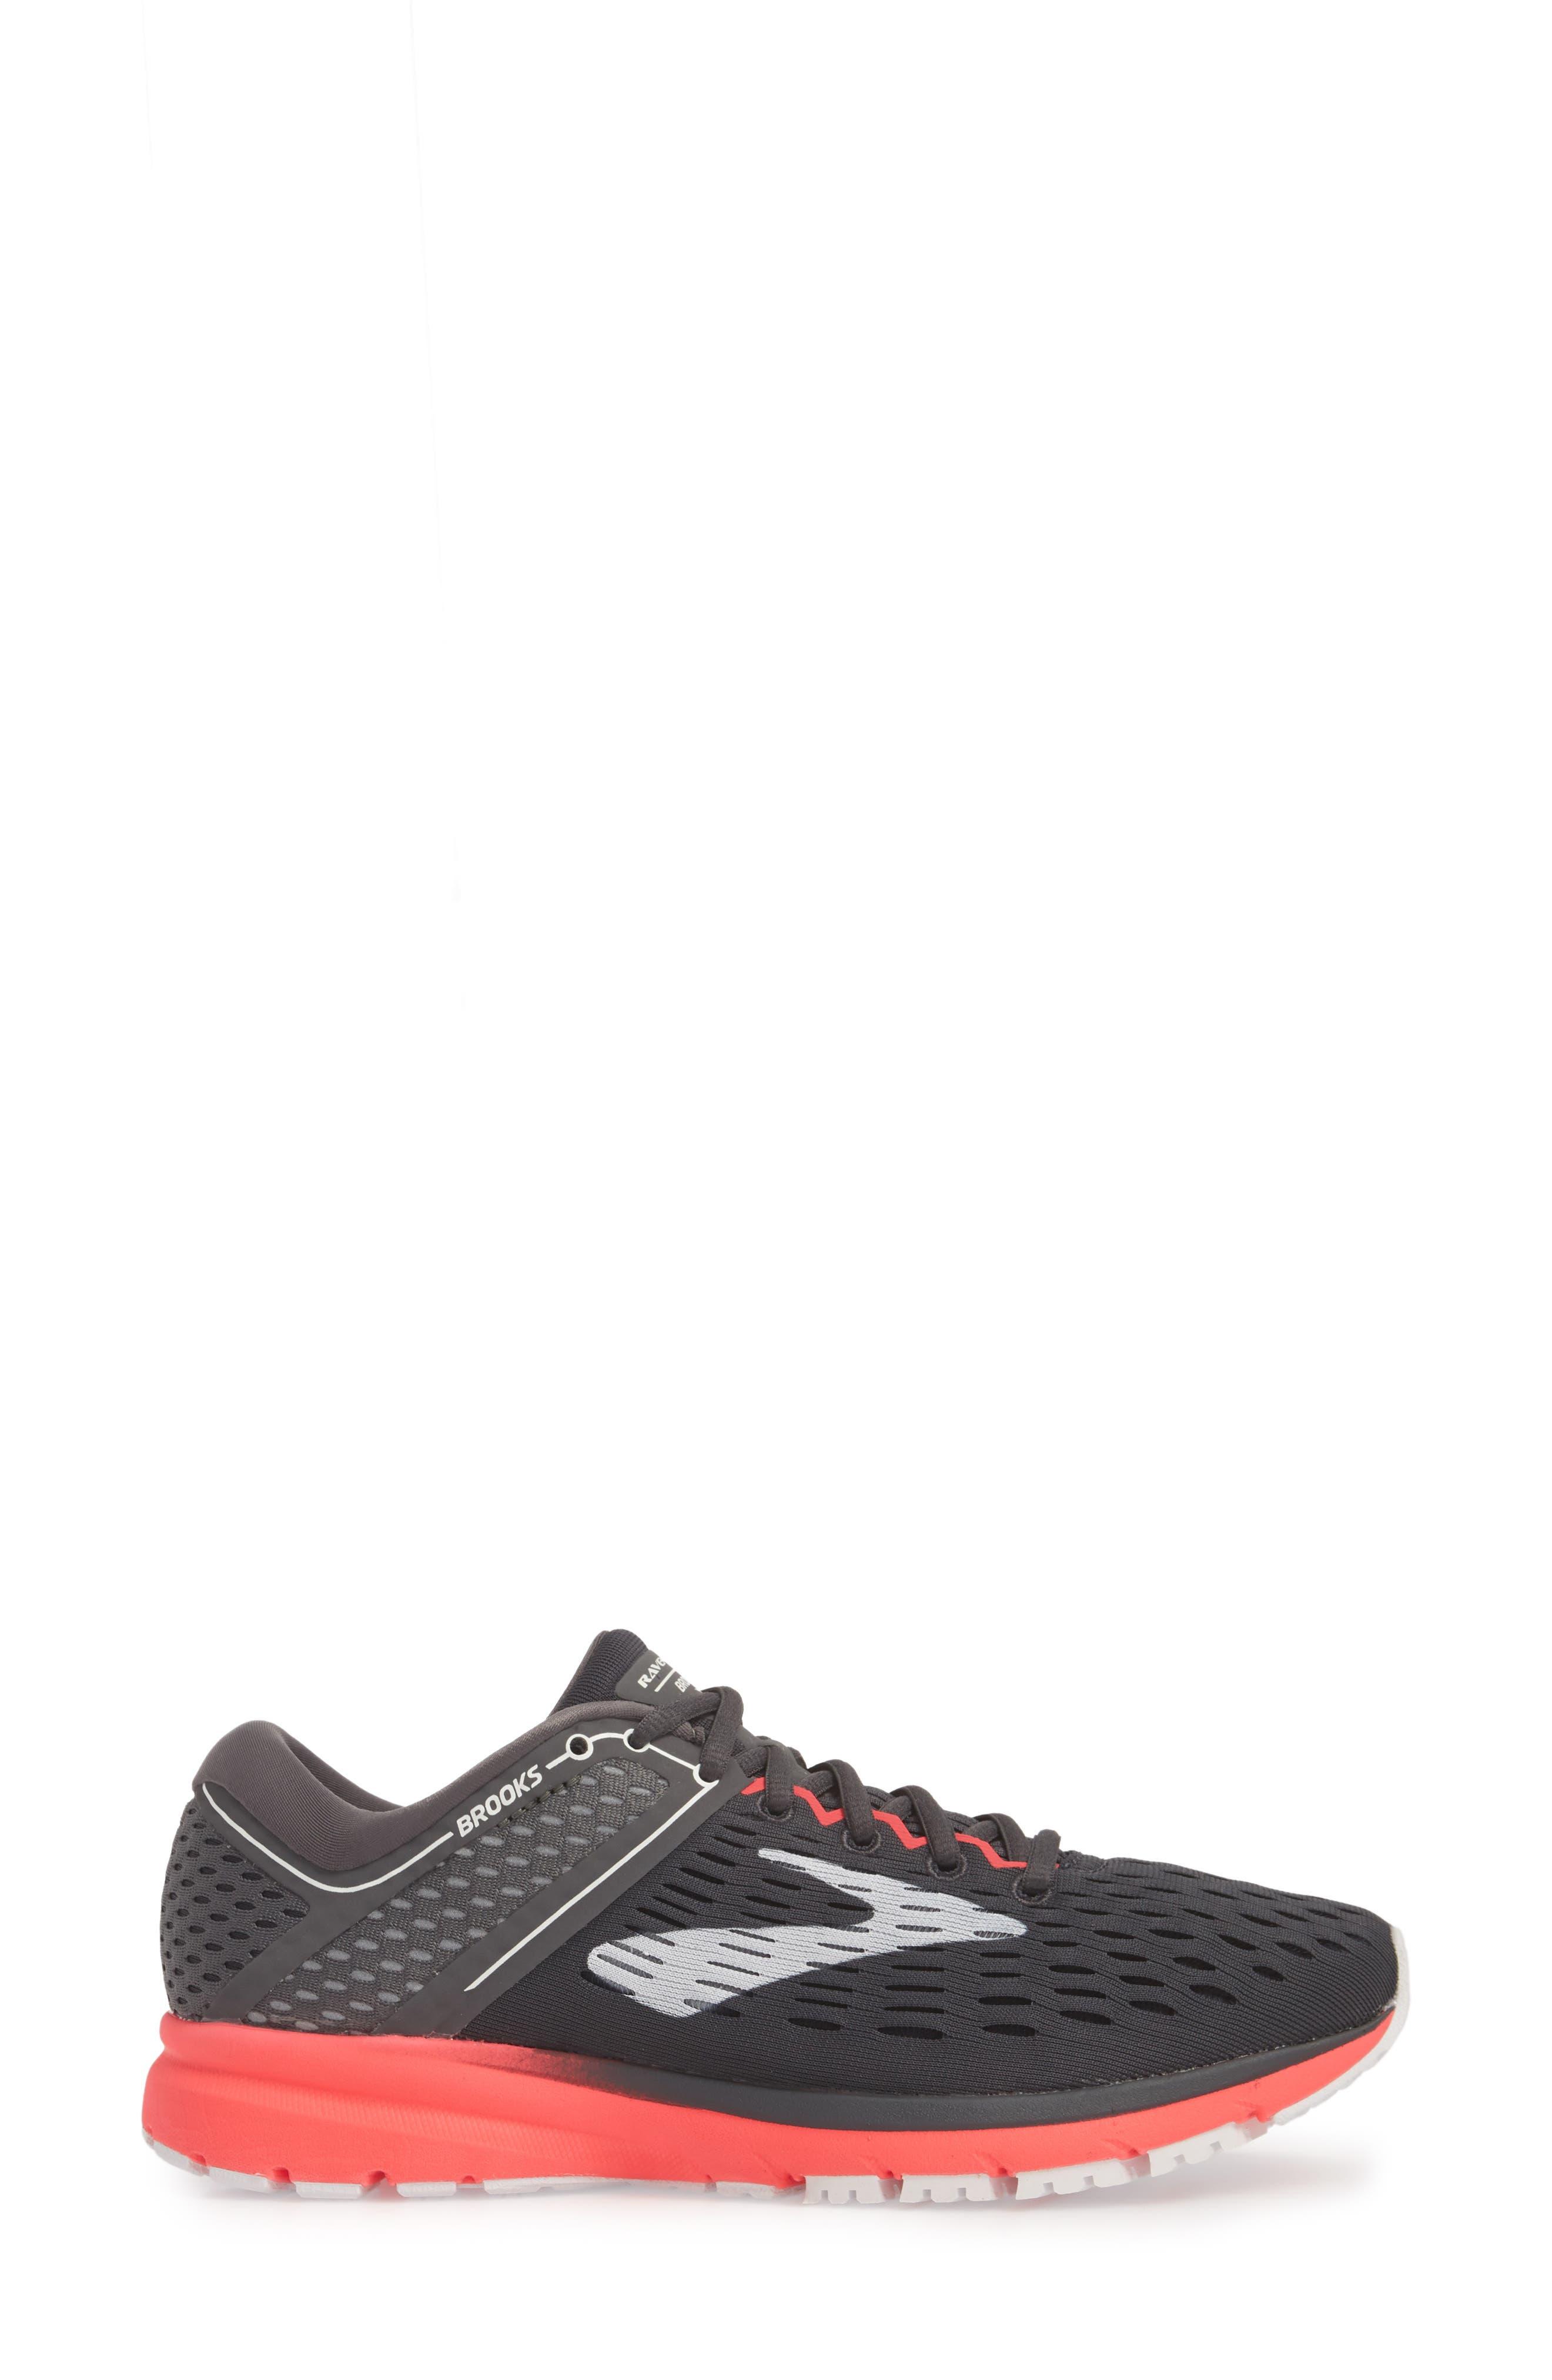 Ravenna 9 Running Shoe,                             Alternate thumbnail 3, color,                             EBONY/ DIVA PINK/ WHITE